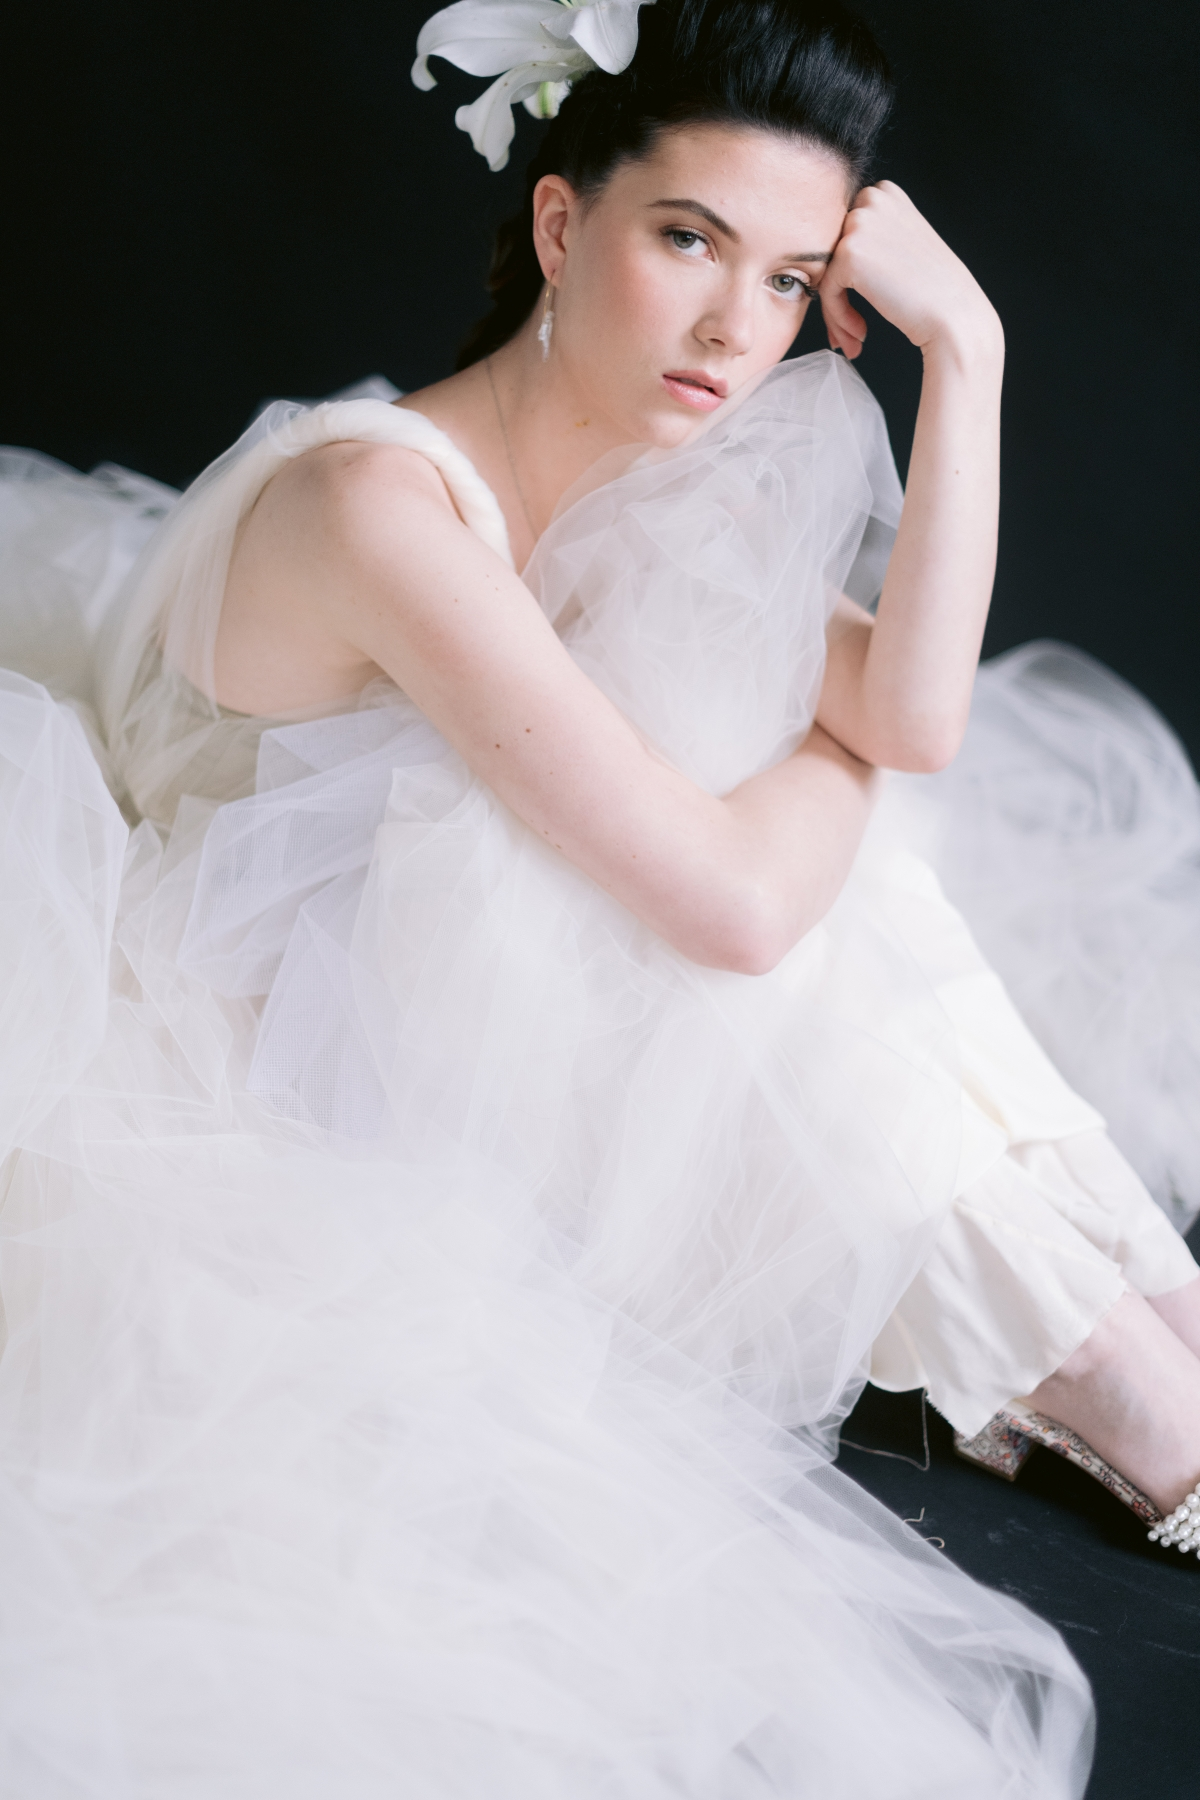 Laura Lanzerotte Bridal Danielle Heinson Photography 101